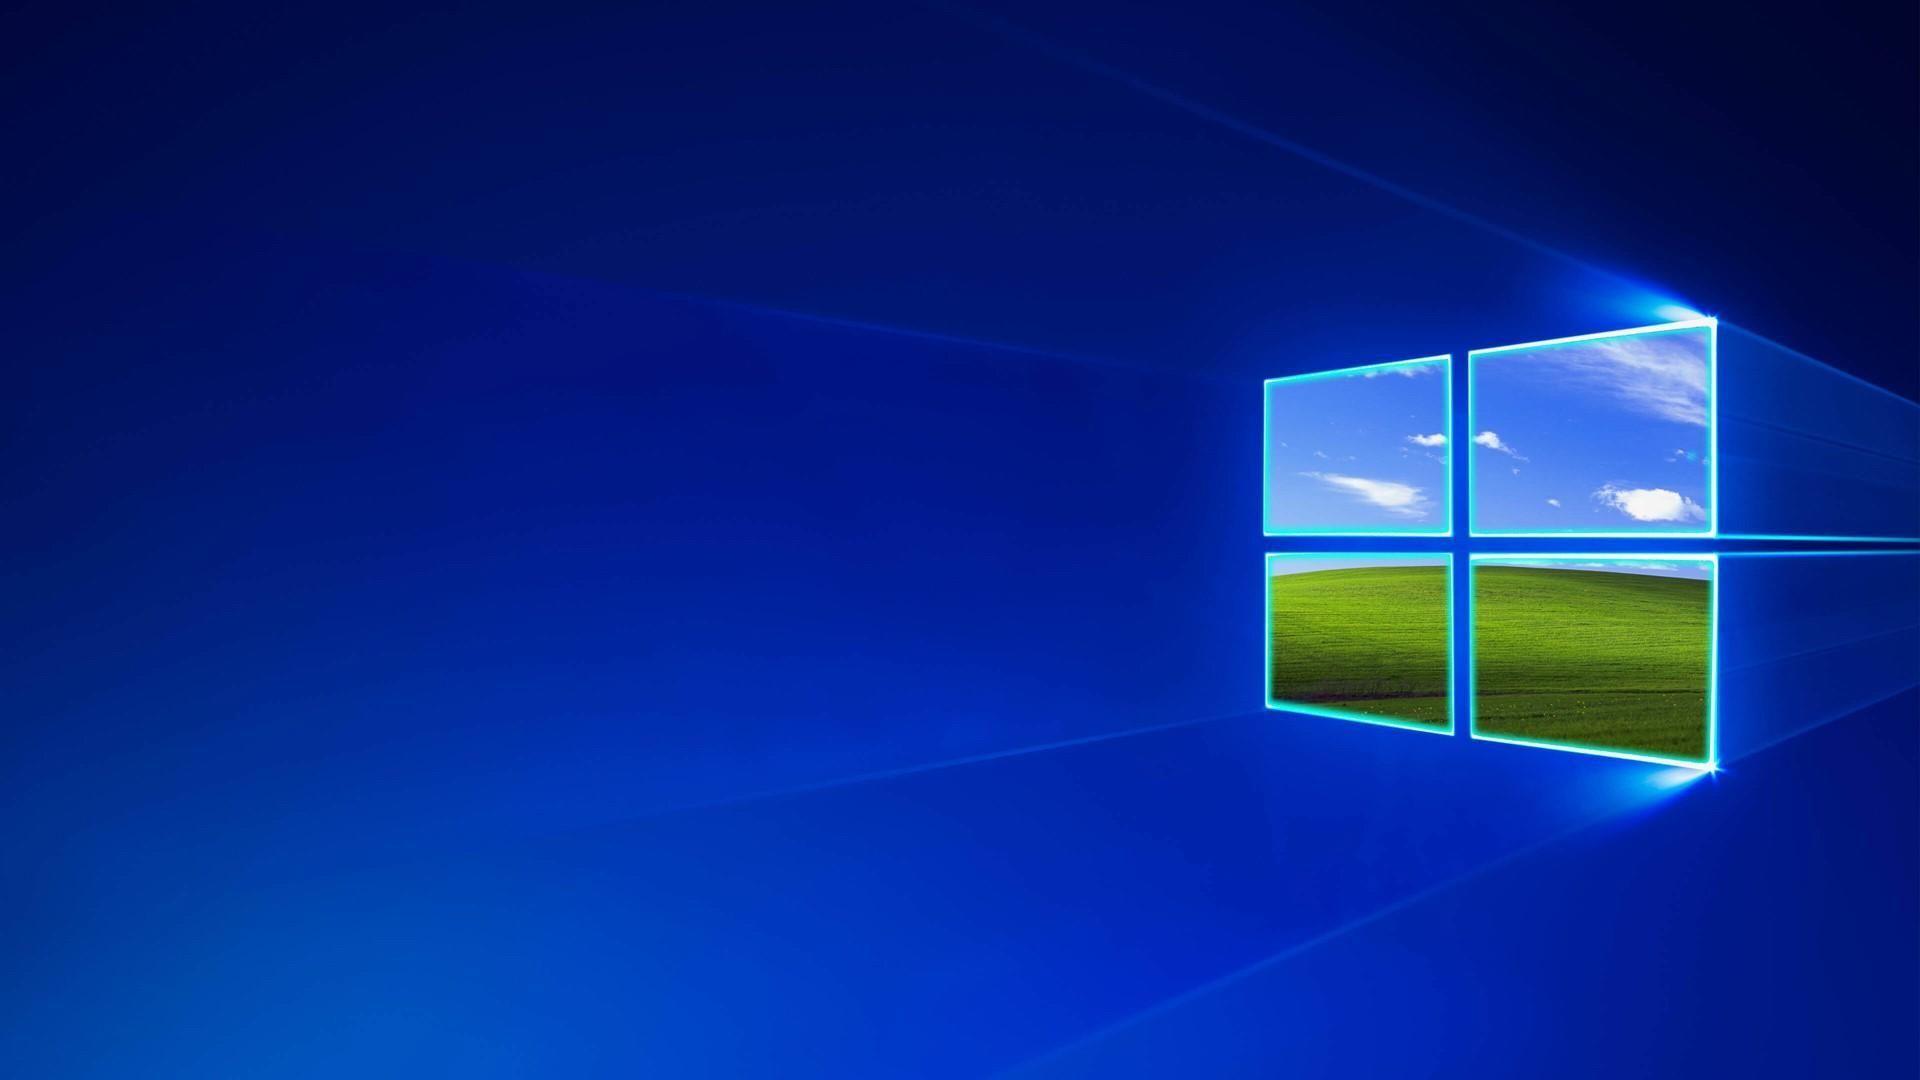 Windows 10 Bliss 19201080 4k Windows 10 Desktop Backgrounds Wallpaper Windows 10 Windows Desktop Wallpaper